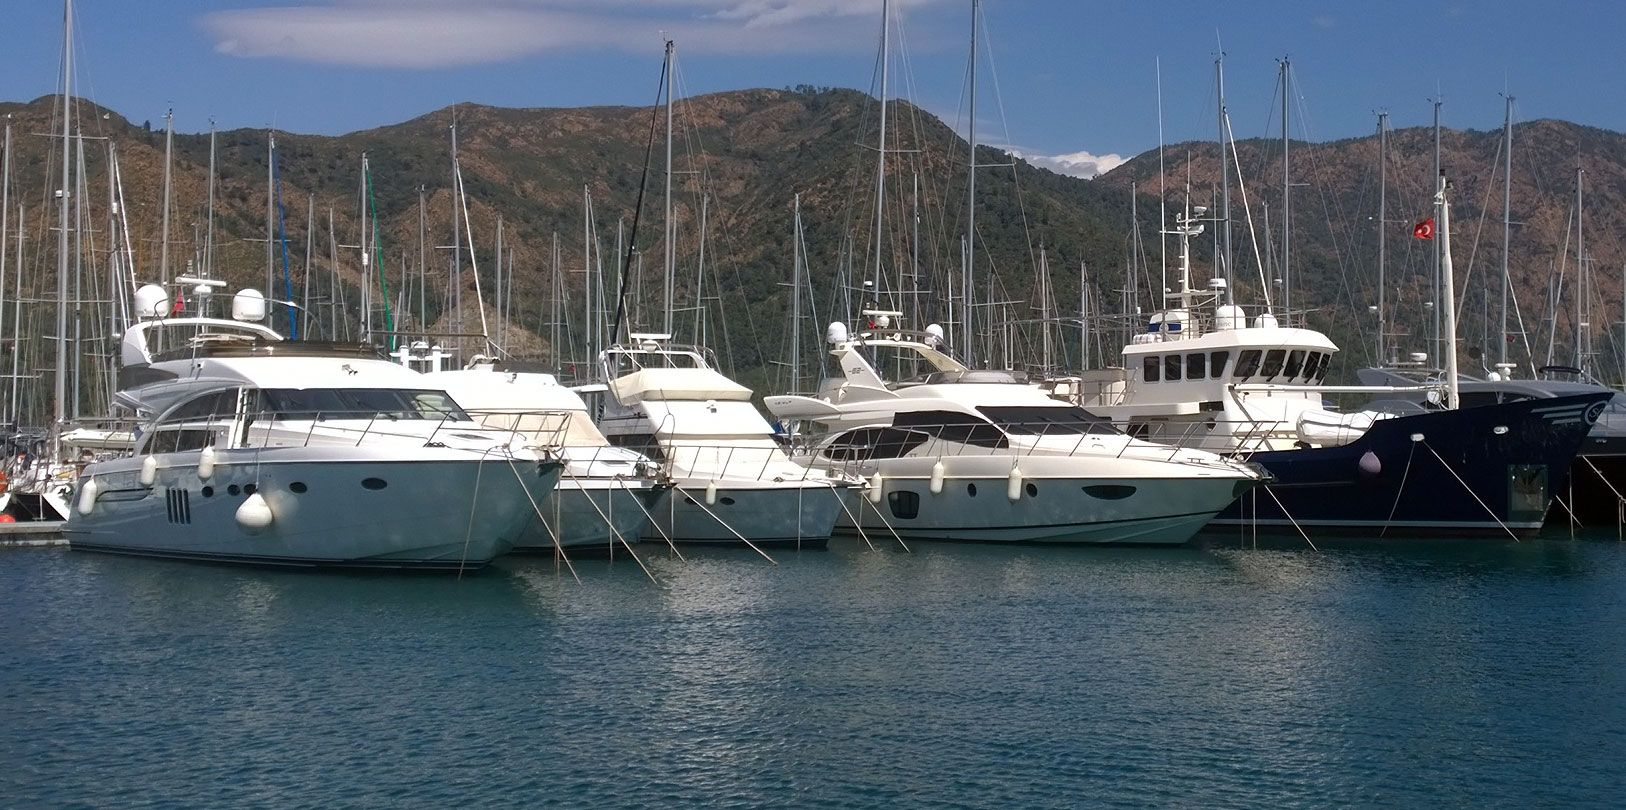 Motor Yachts For Sale in Turkey